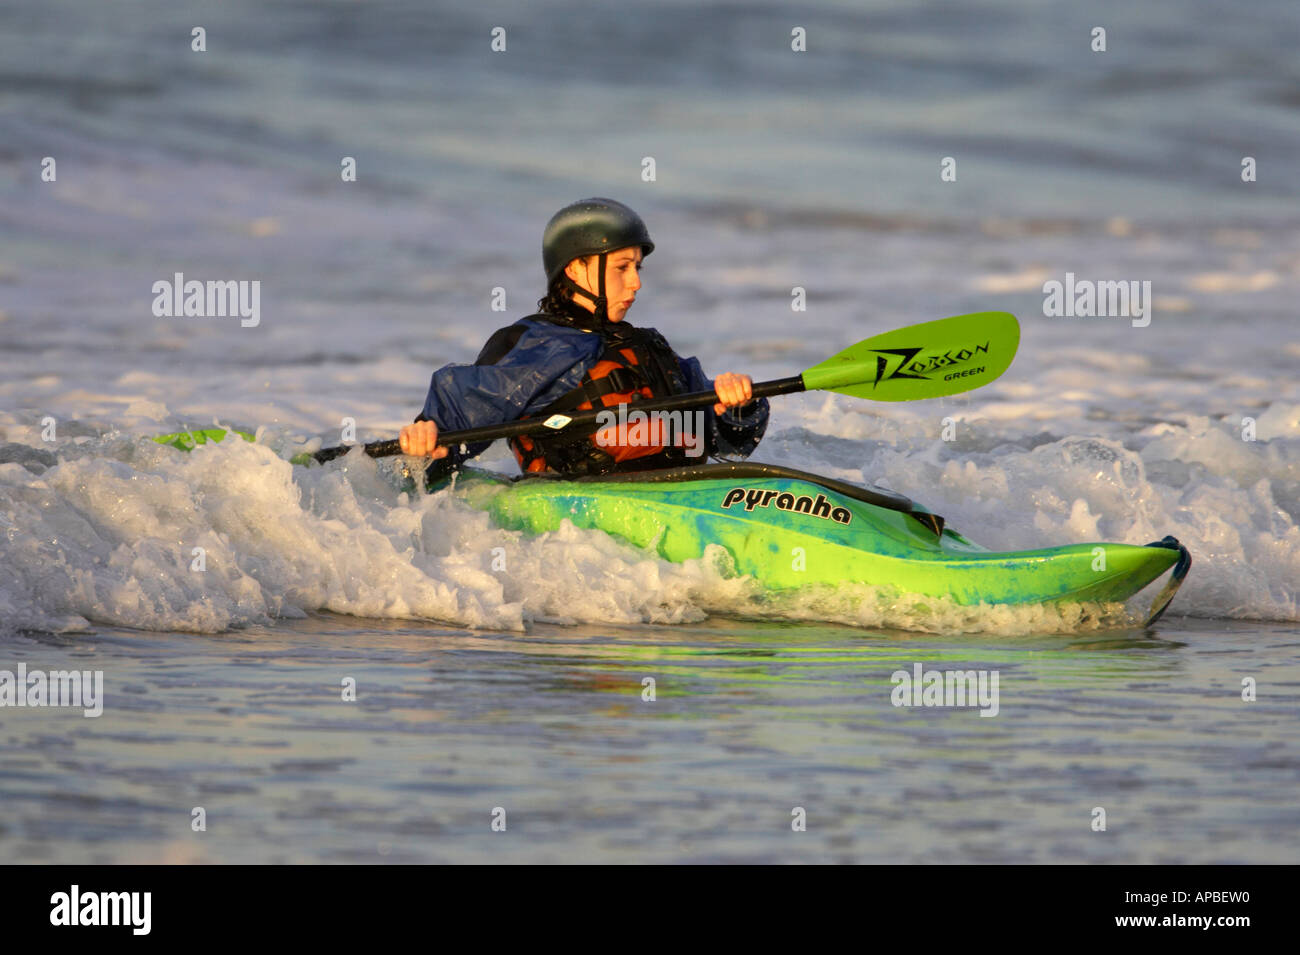 Female kayaker rides a wave off white rocks beach portrush county antrim northern ireland - Stock Image